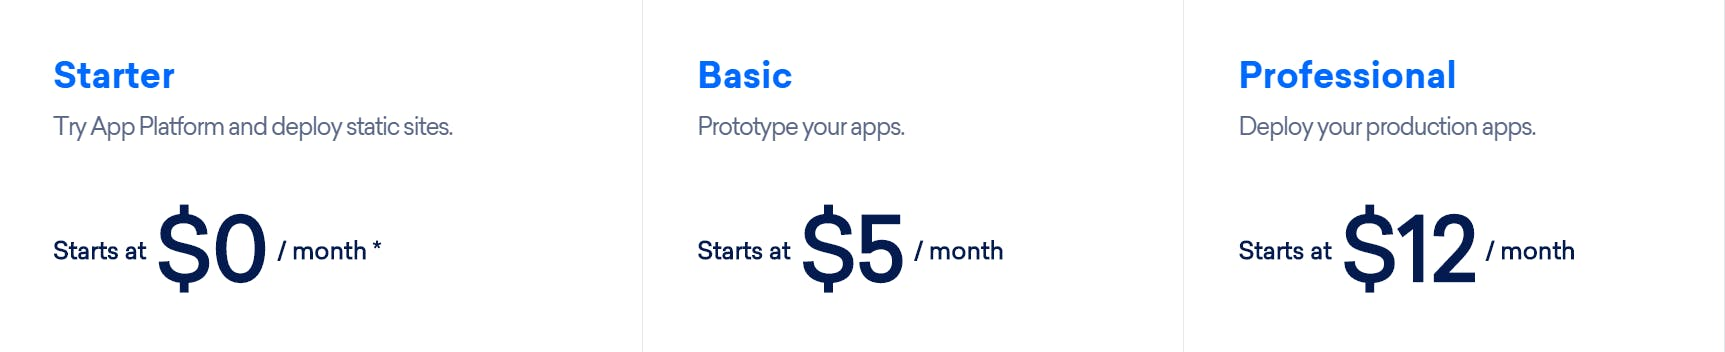 App Platform prices